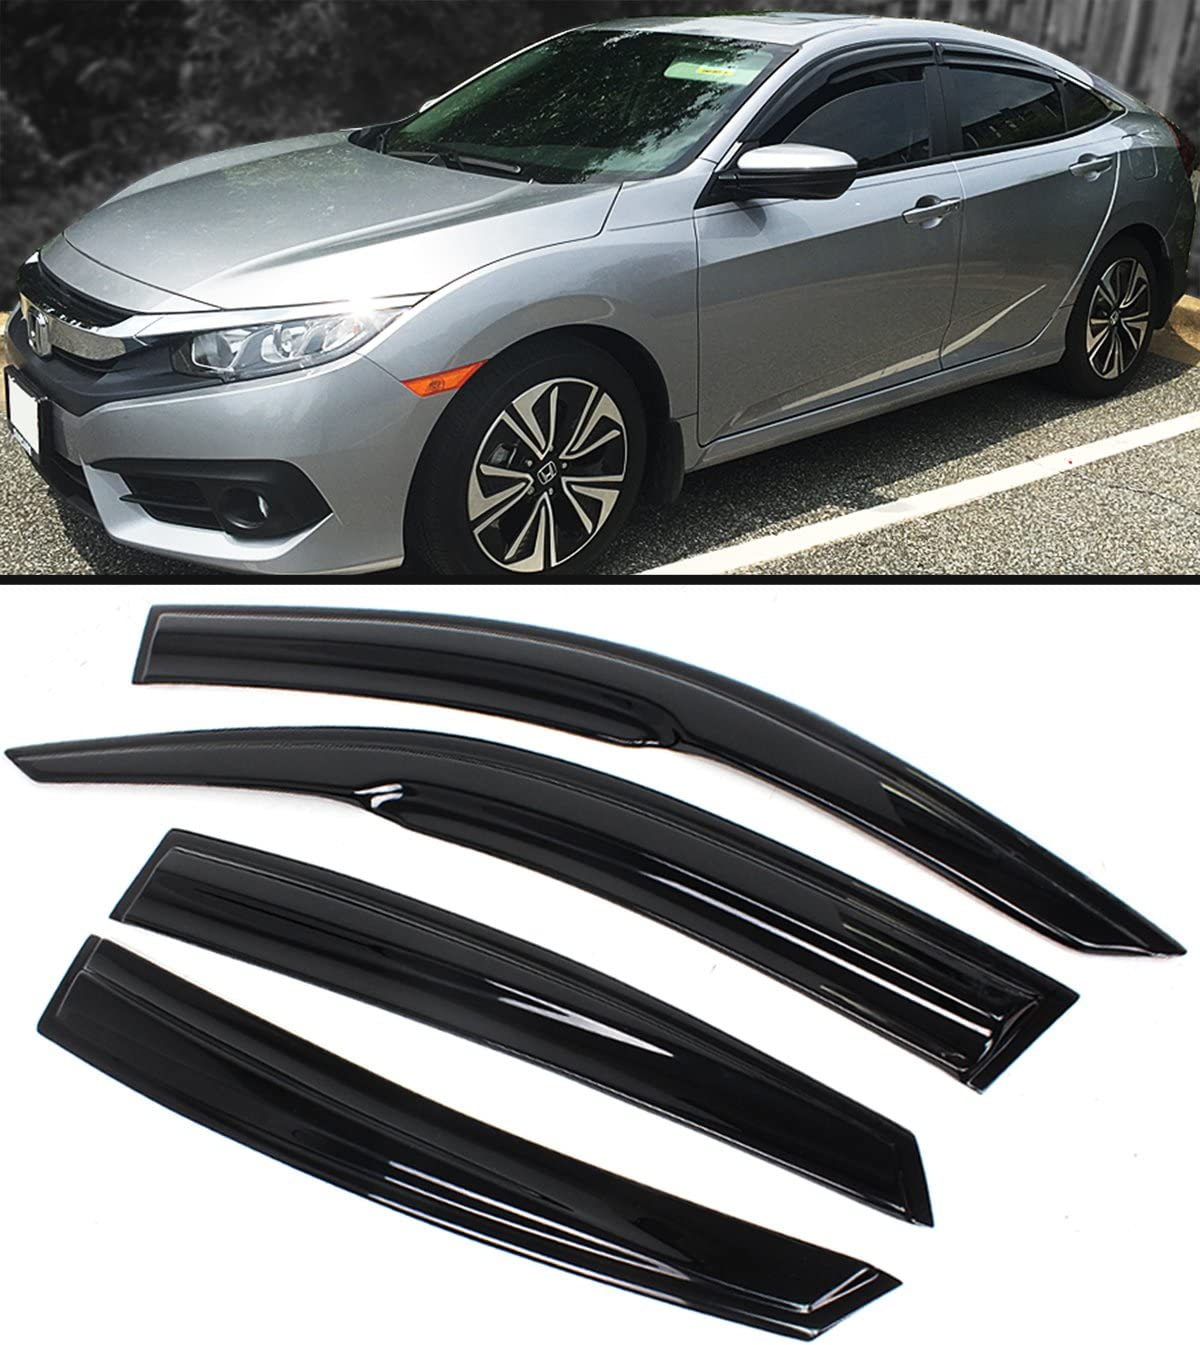 Cuztom Tuning JDM 3D Style Wavy Smoked Window Visor Rain Guard Deflector Fits for 2016-2019 10TH Honda Civic 4 Door Sedan